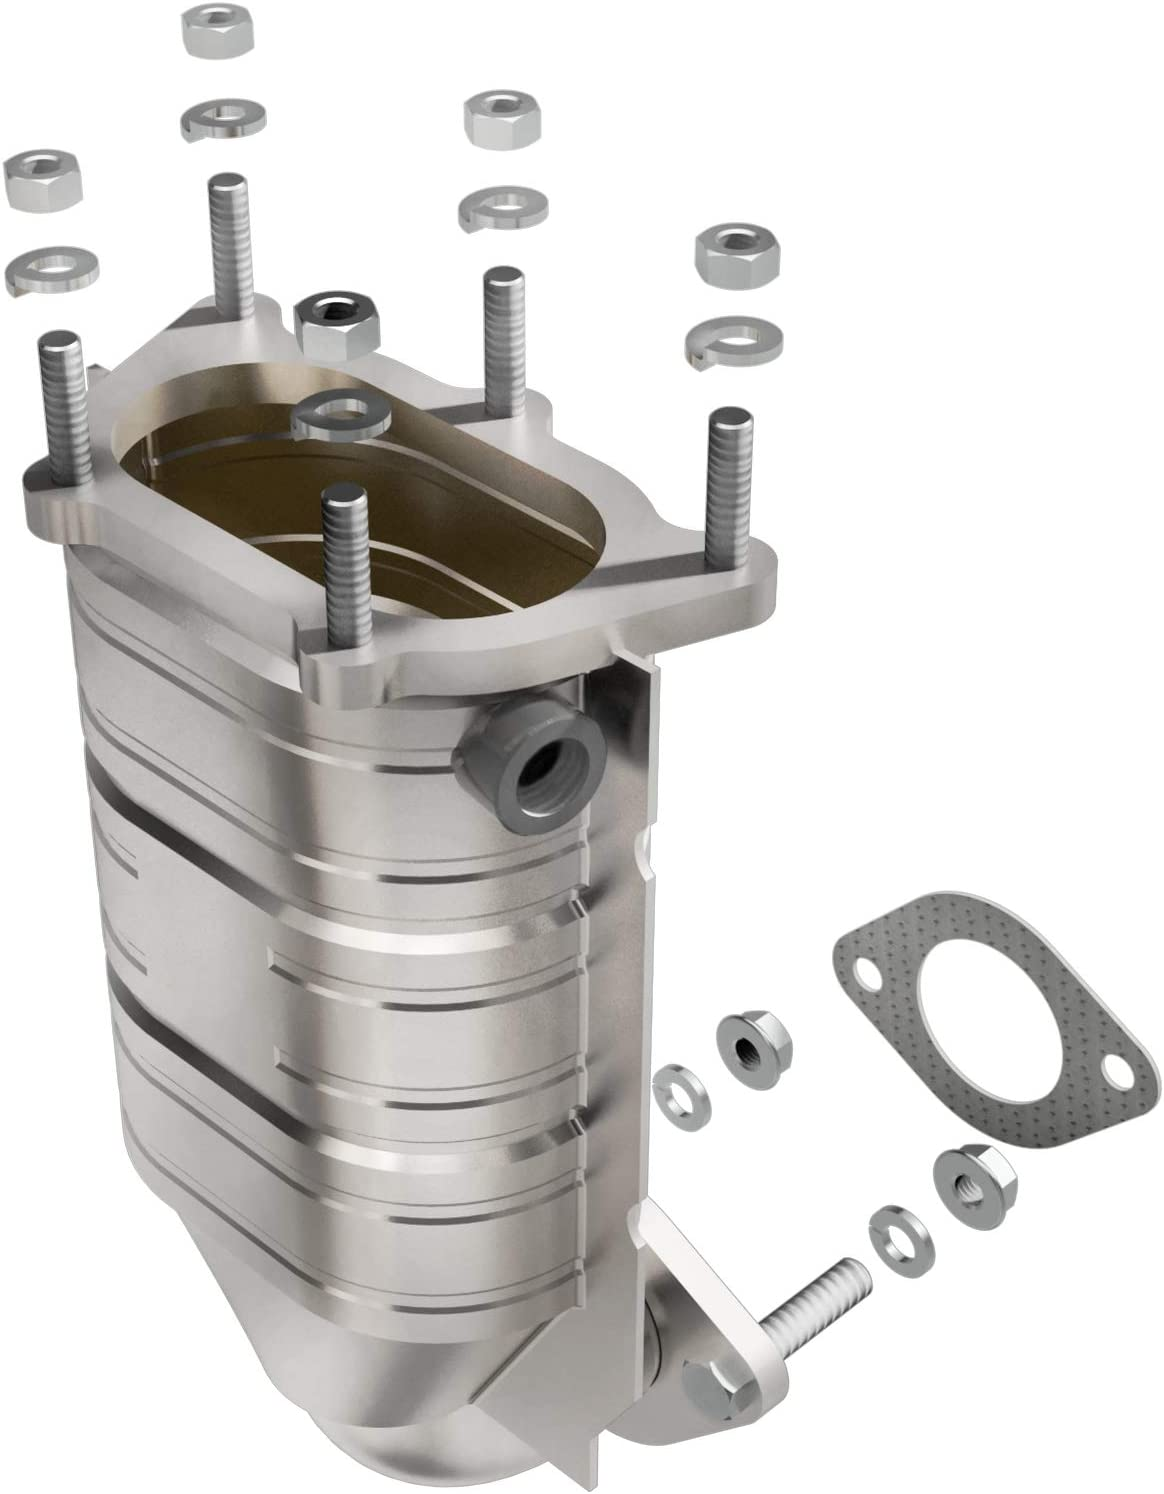 Non CARB compliant MagnaFlow 49297 Direct Fit Catalytic Converter